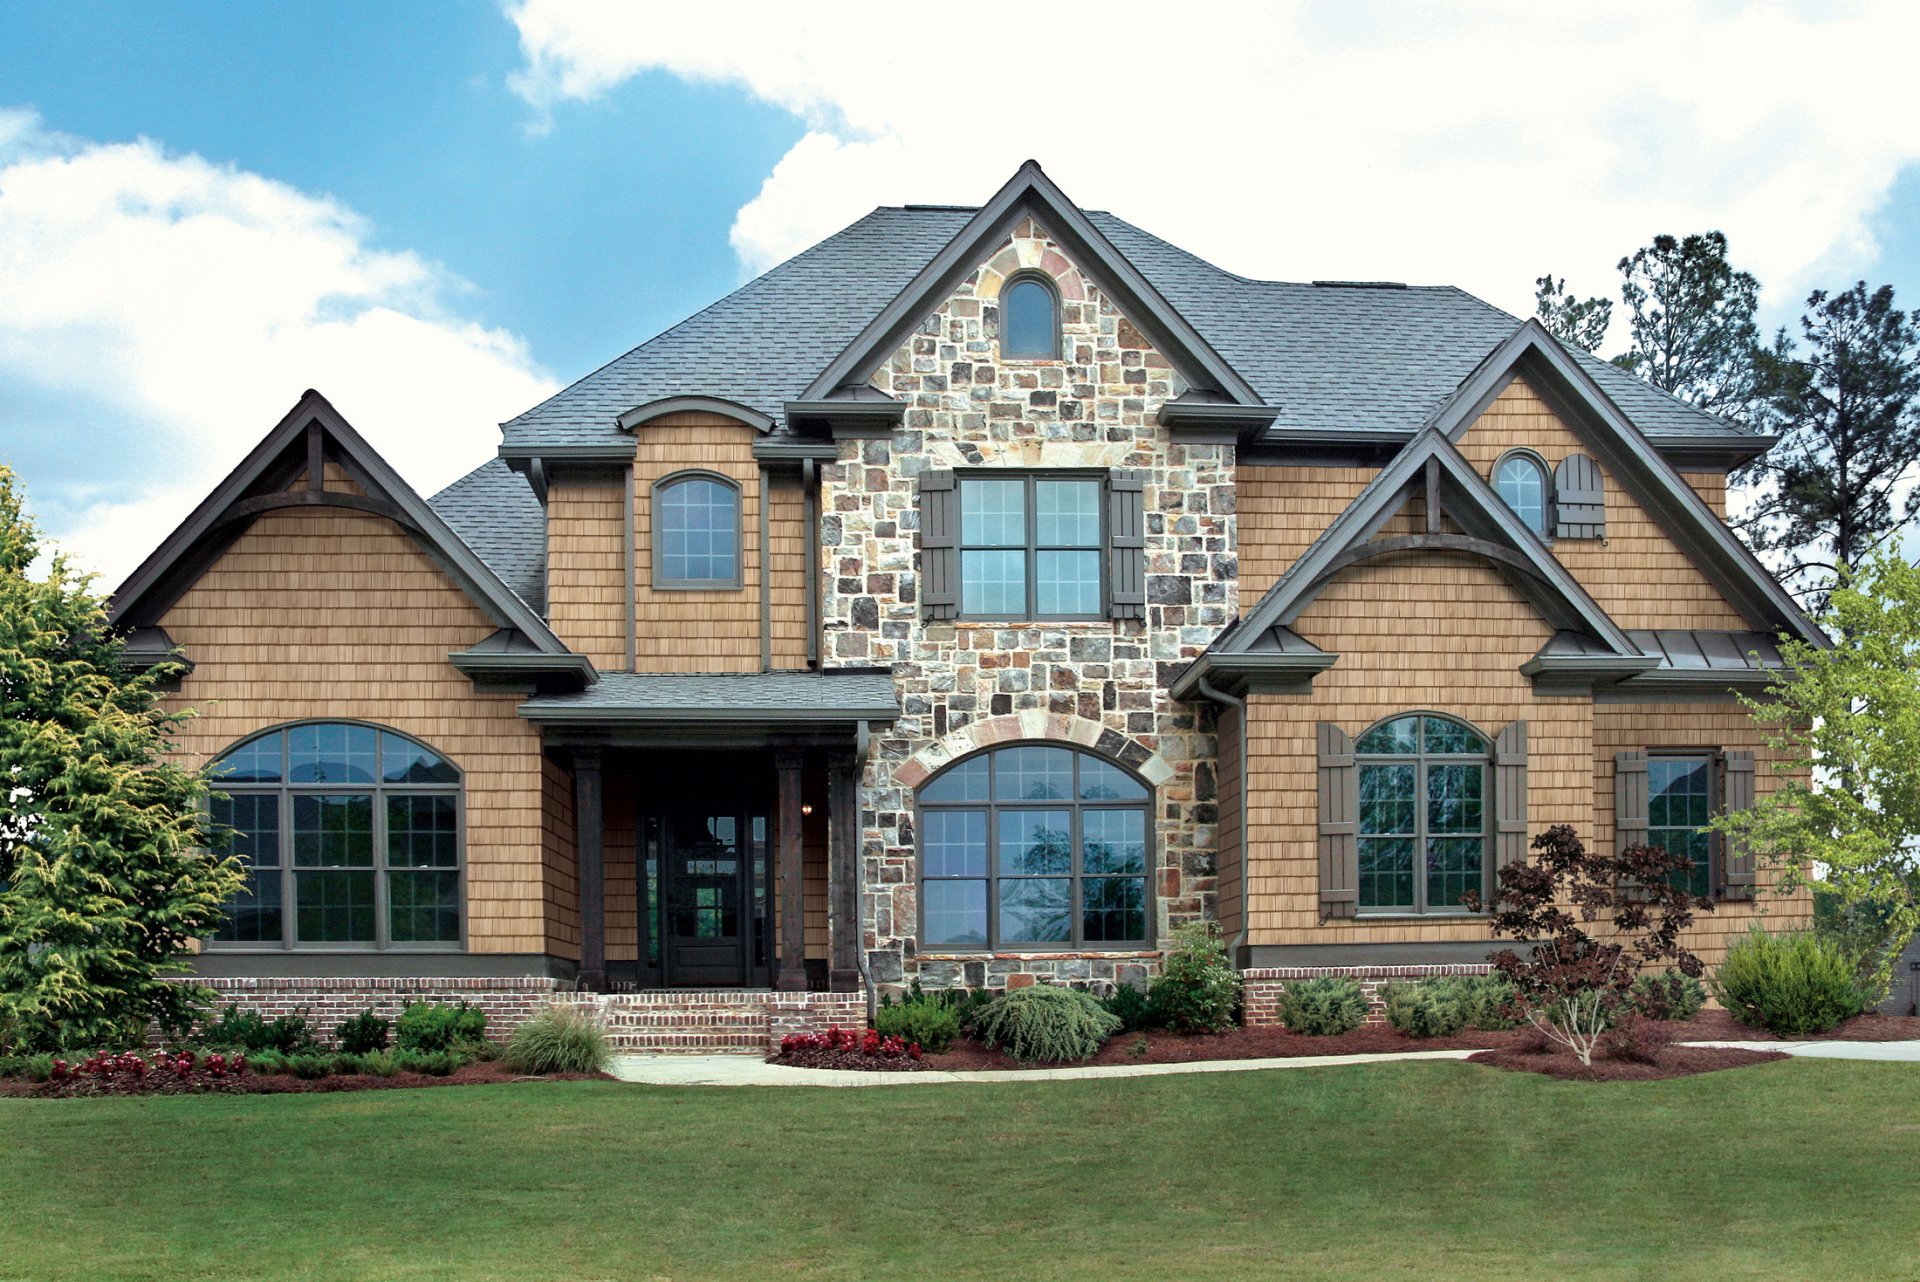 31 fondos de pantalla de casas wallpapers hd - Images of exterior house designs ...